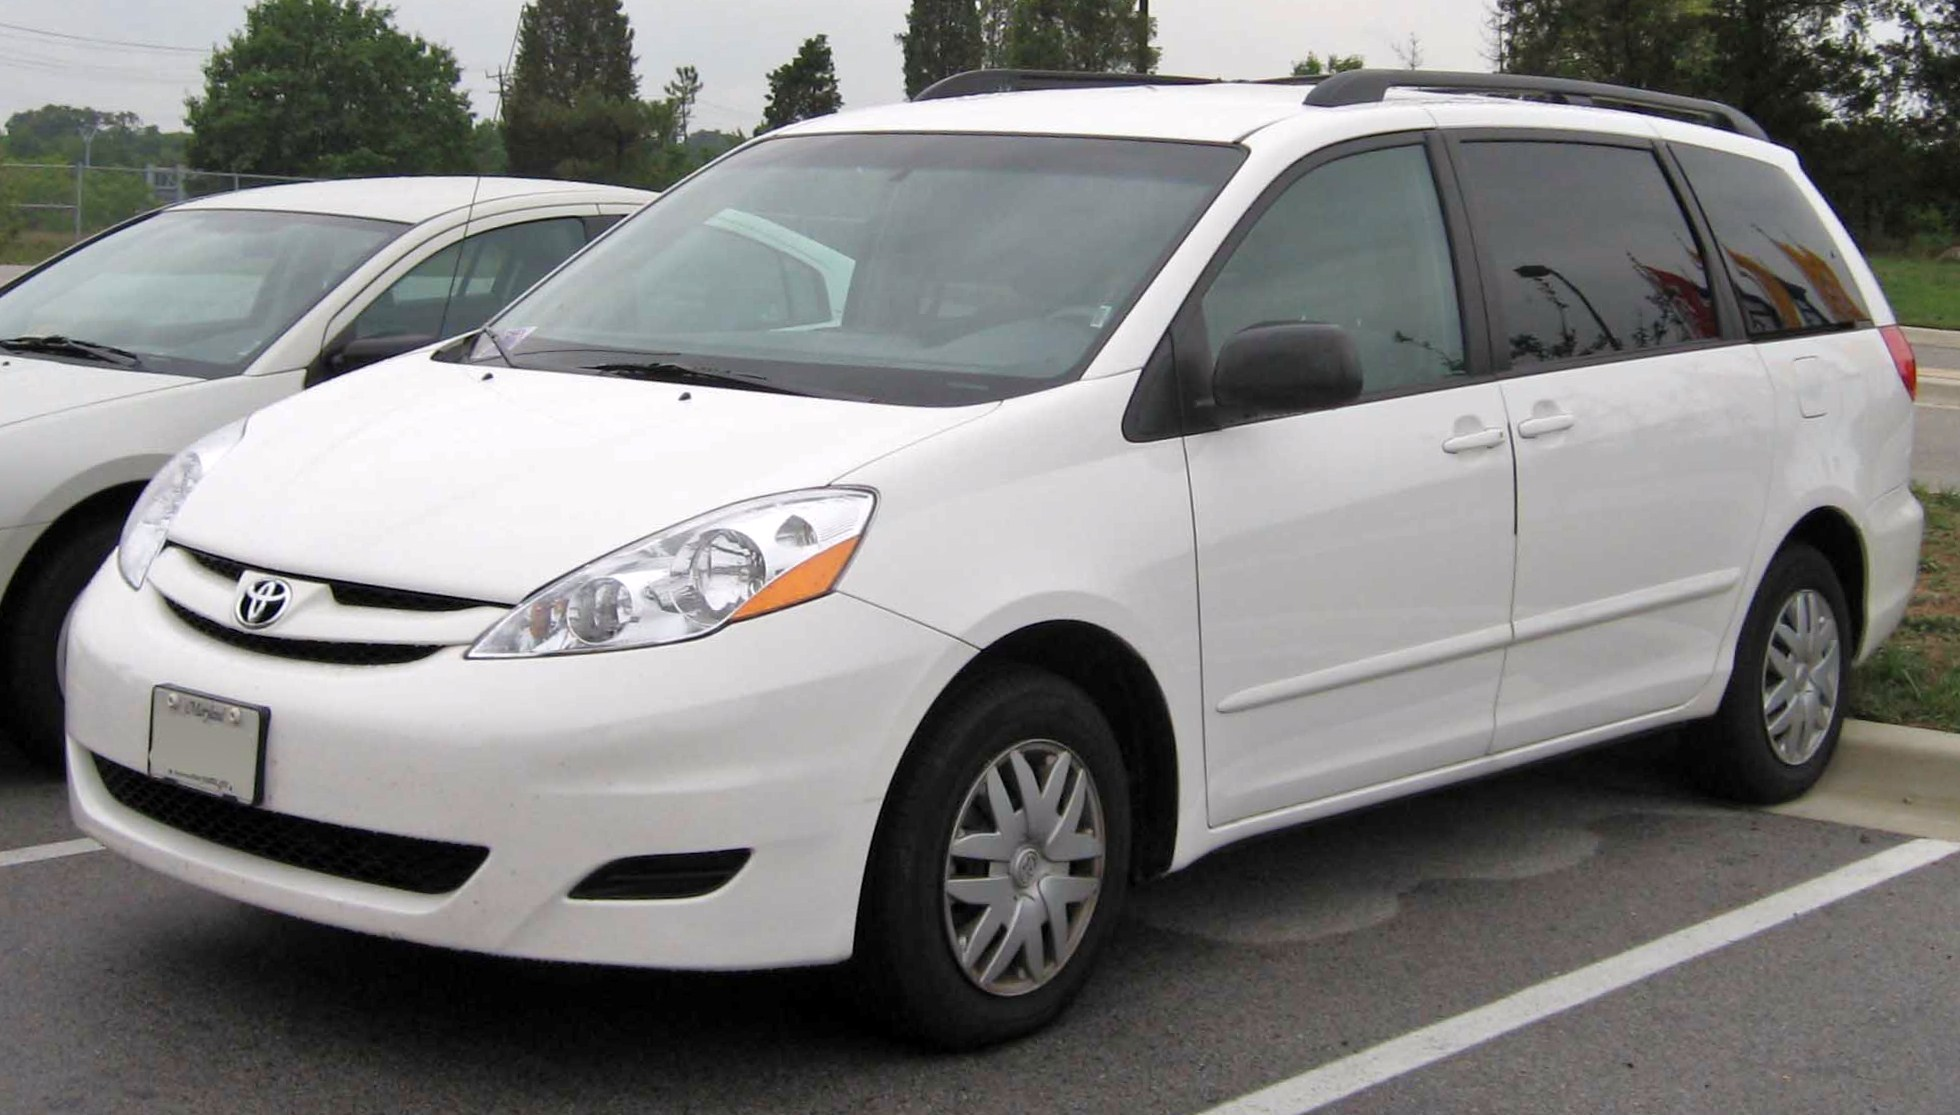 File:06-08 Toyota Sienna LE.jpg - Wikimedia Commons